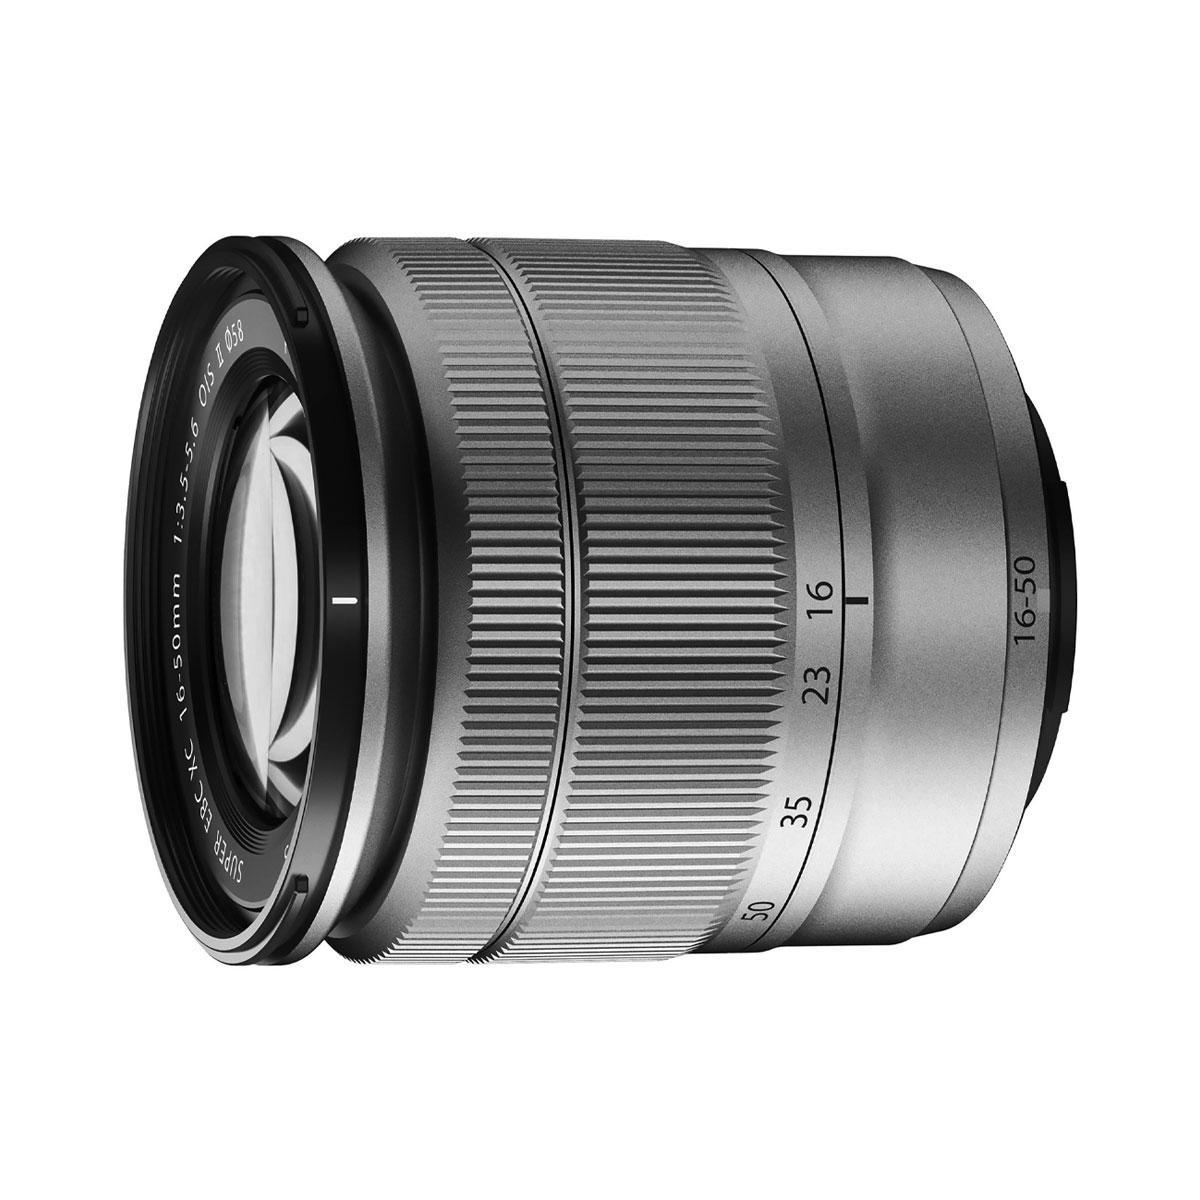 Fujinon XC 16-50mm / f3,5-5,6 OIS – X-mount Hopea